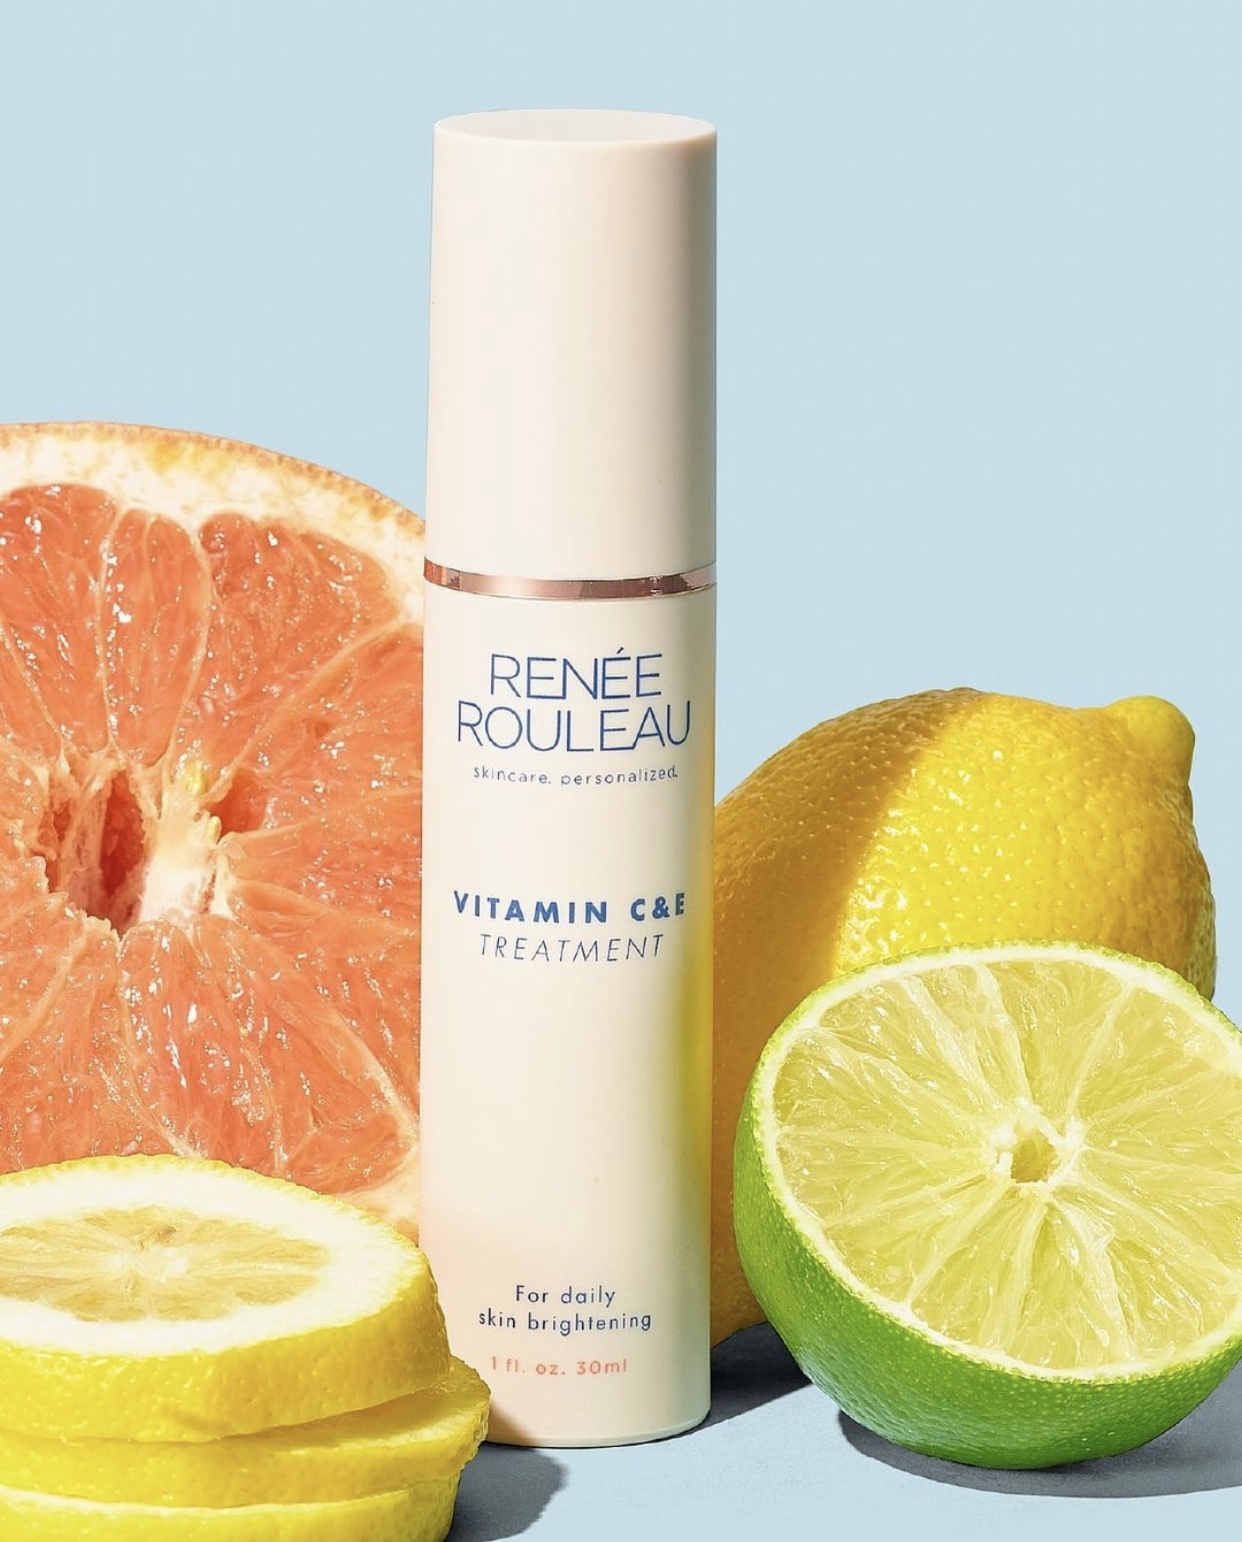 Vitamin C&E Treatment from Renee Rouleau Skincare